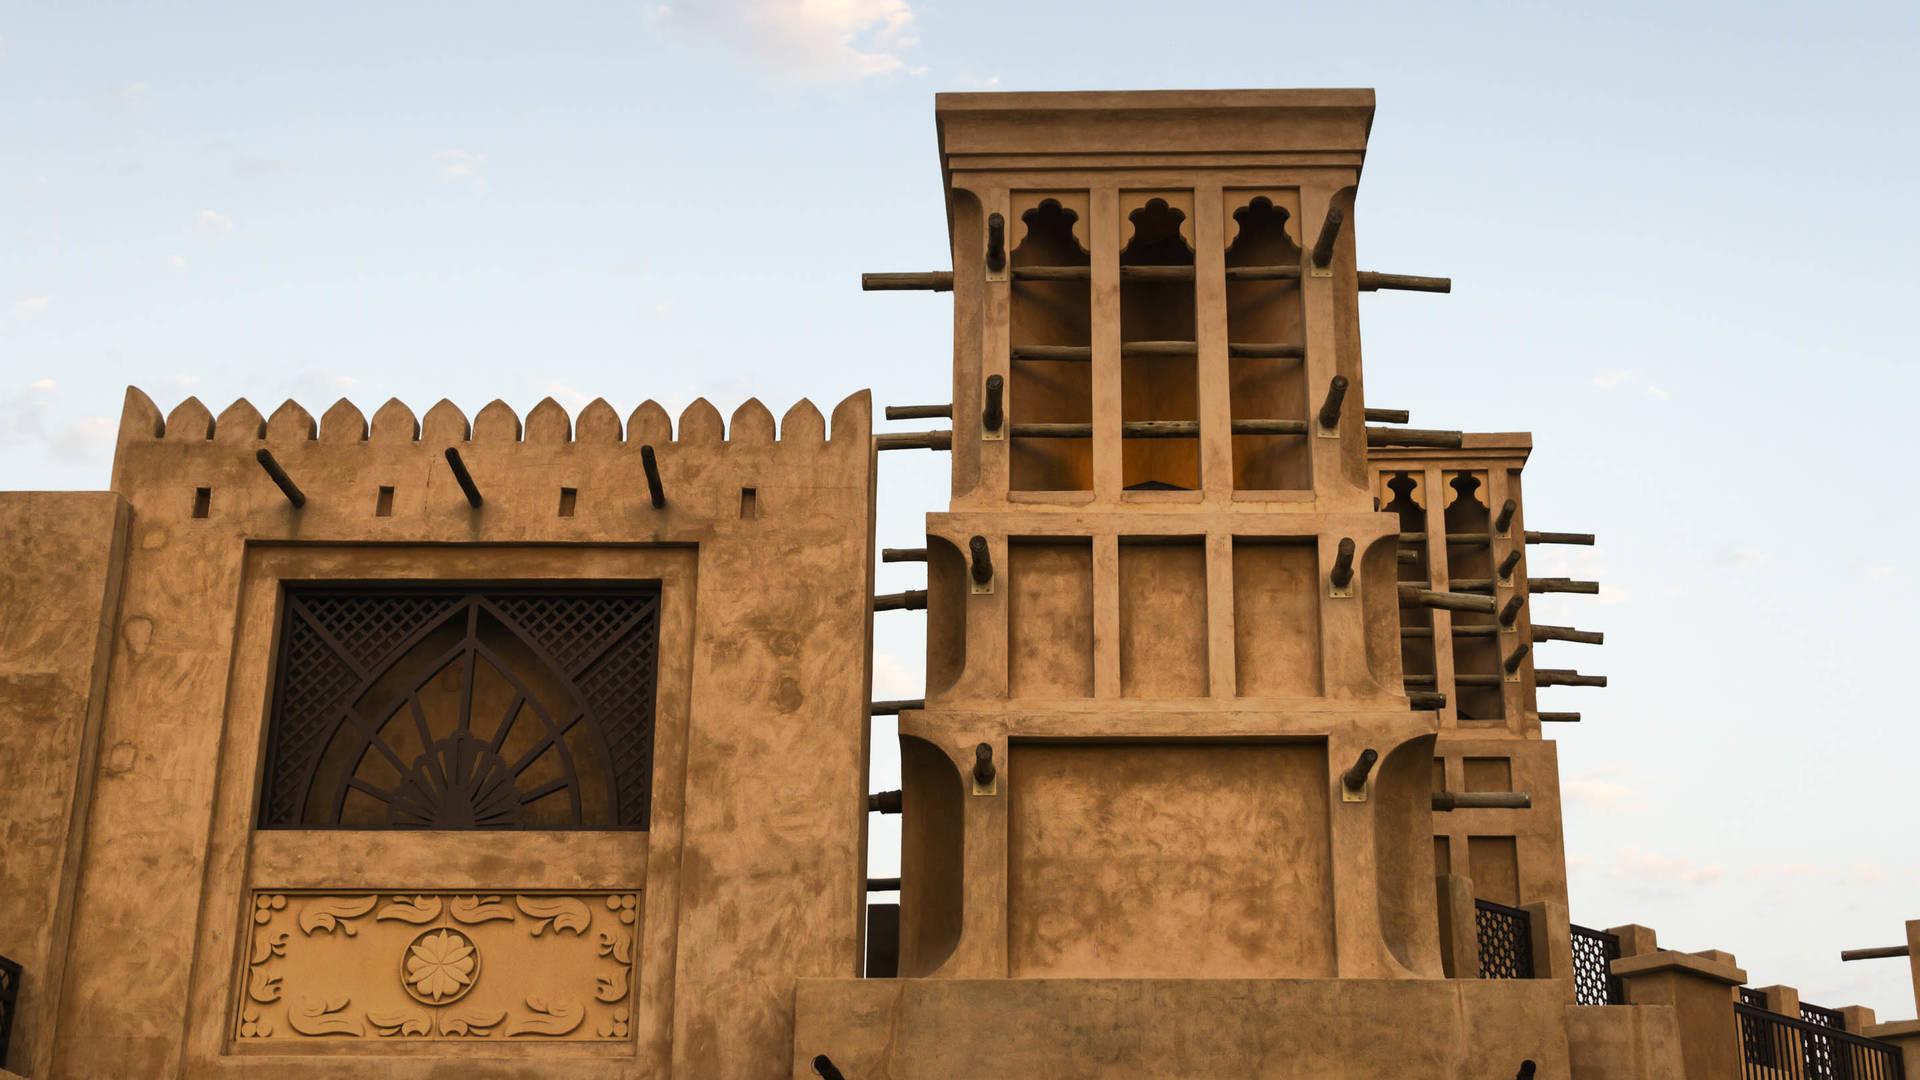 Souk Madinat Jumeirah old architecture istock Dubai